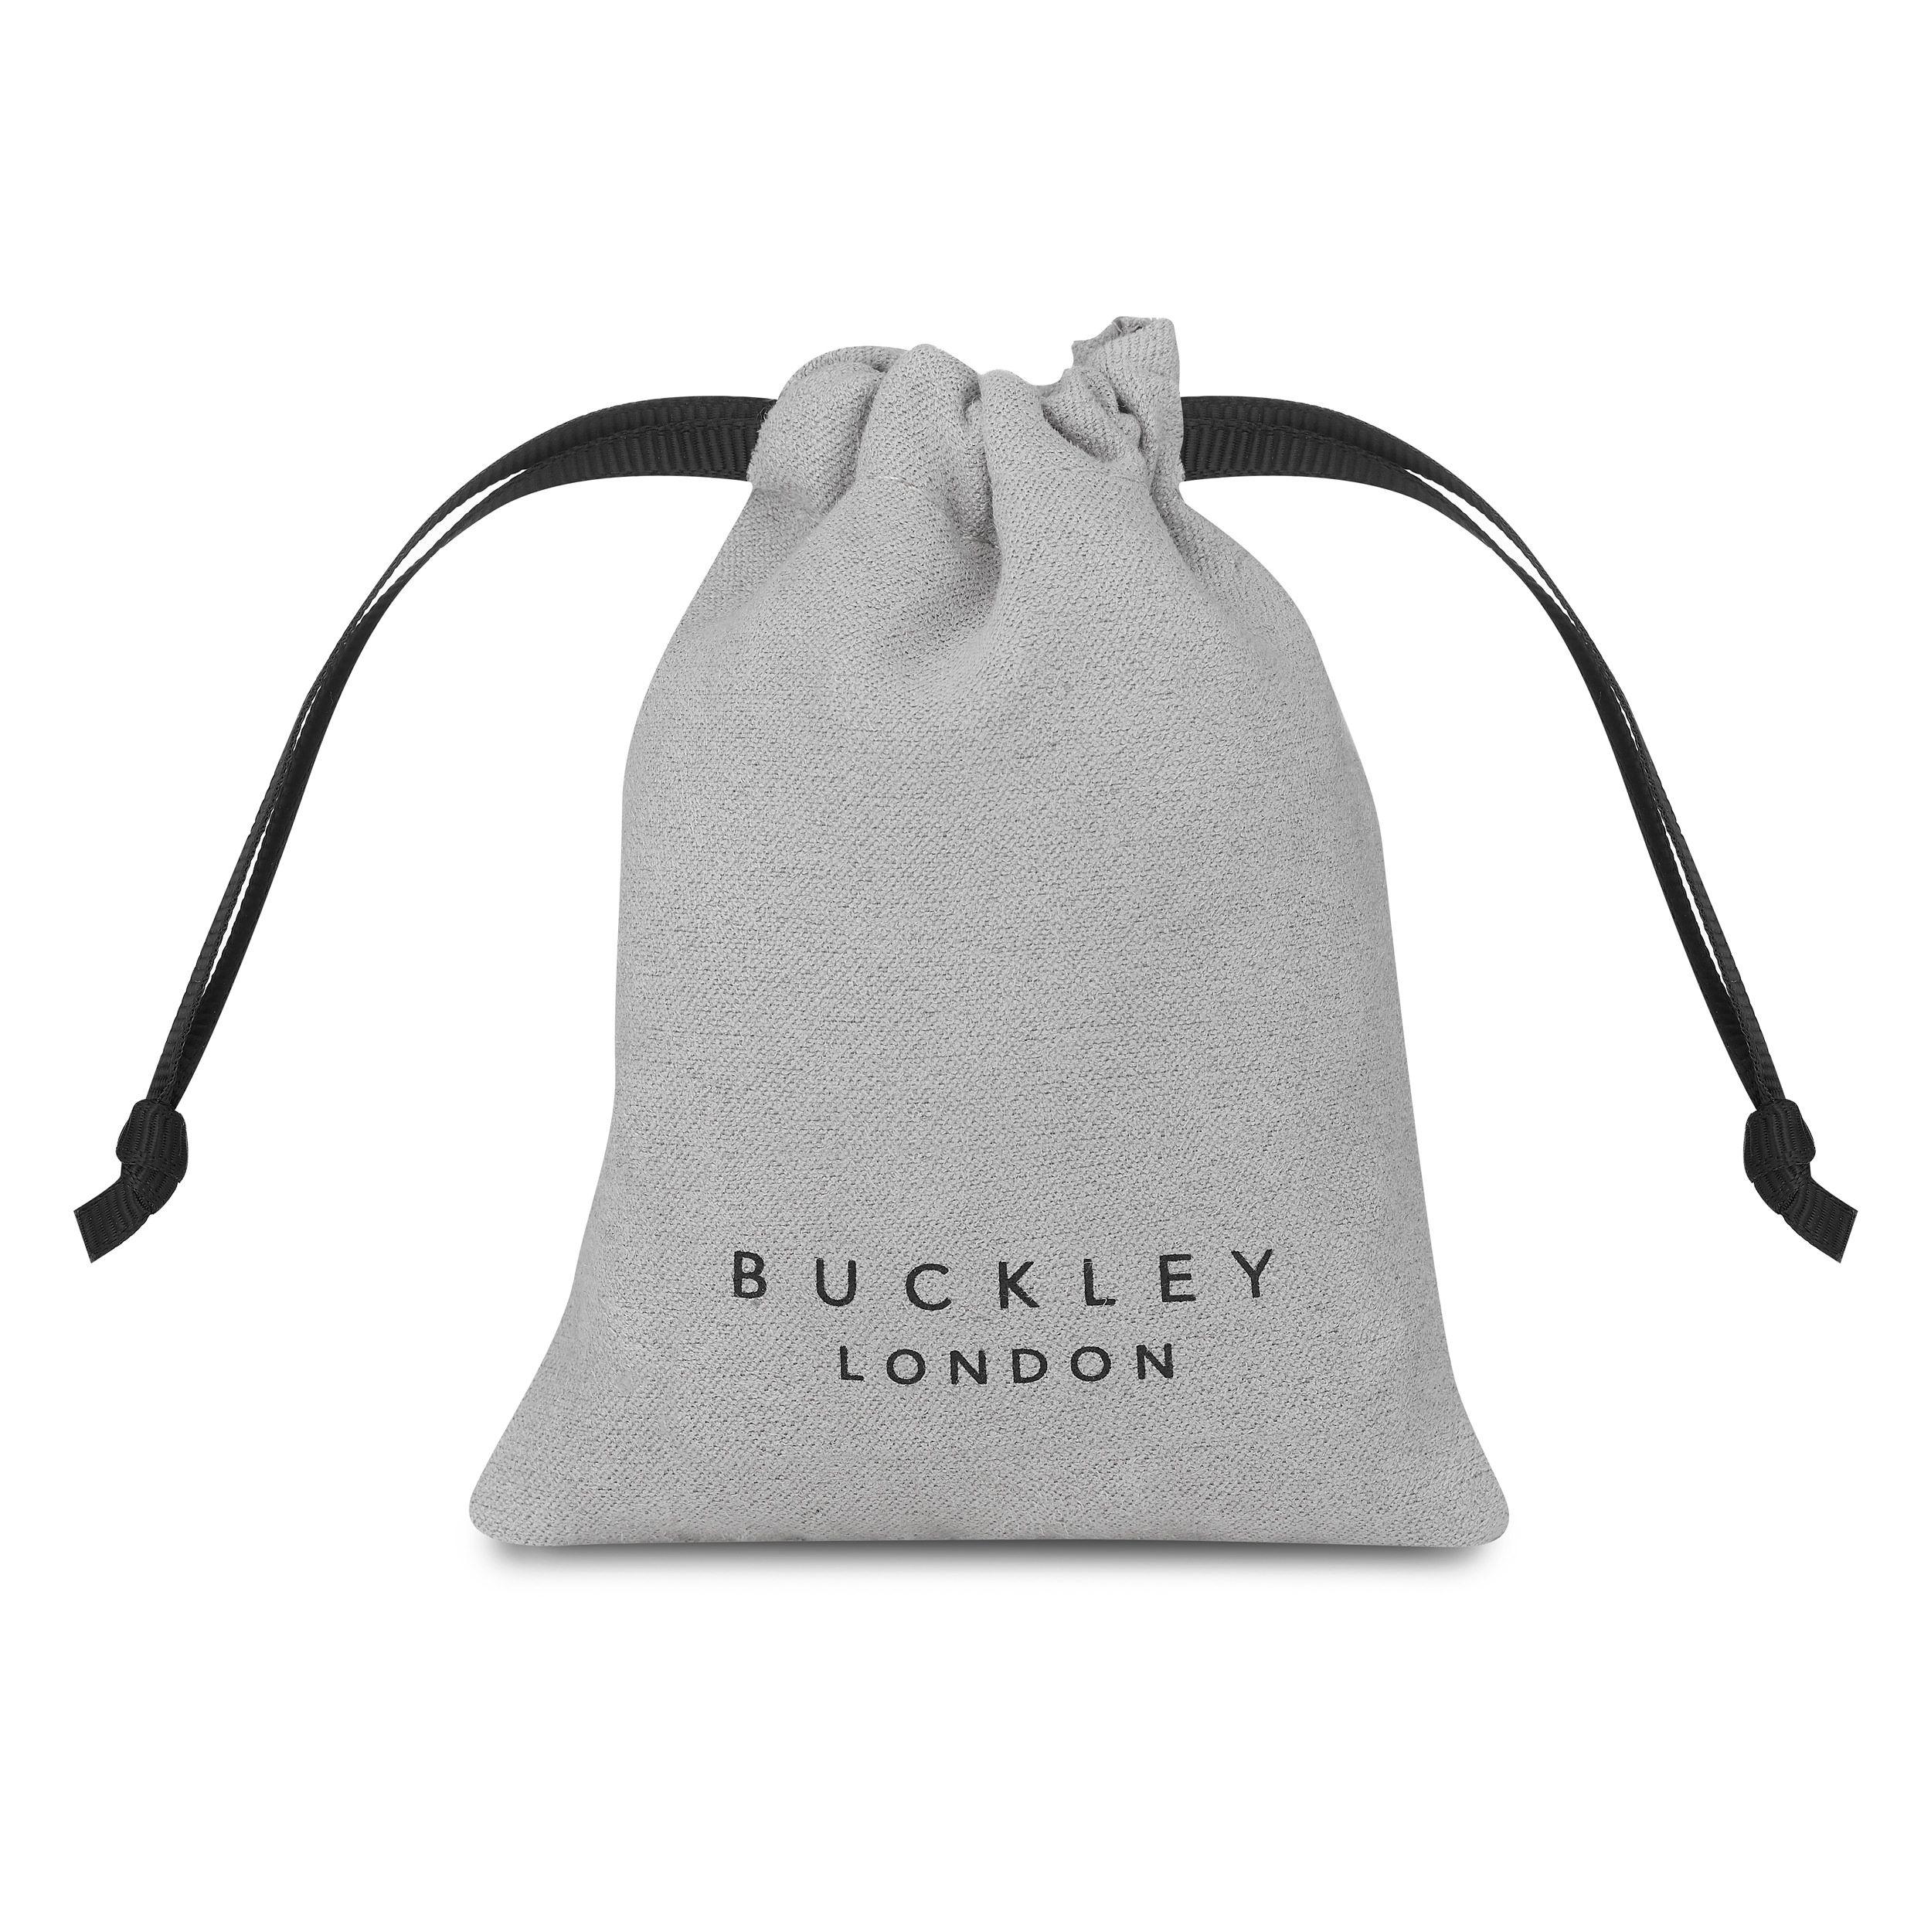 Buckley London Hugs & Kisses 'O' Bracelet - Gold Bag